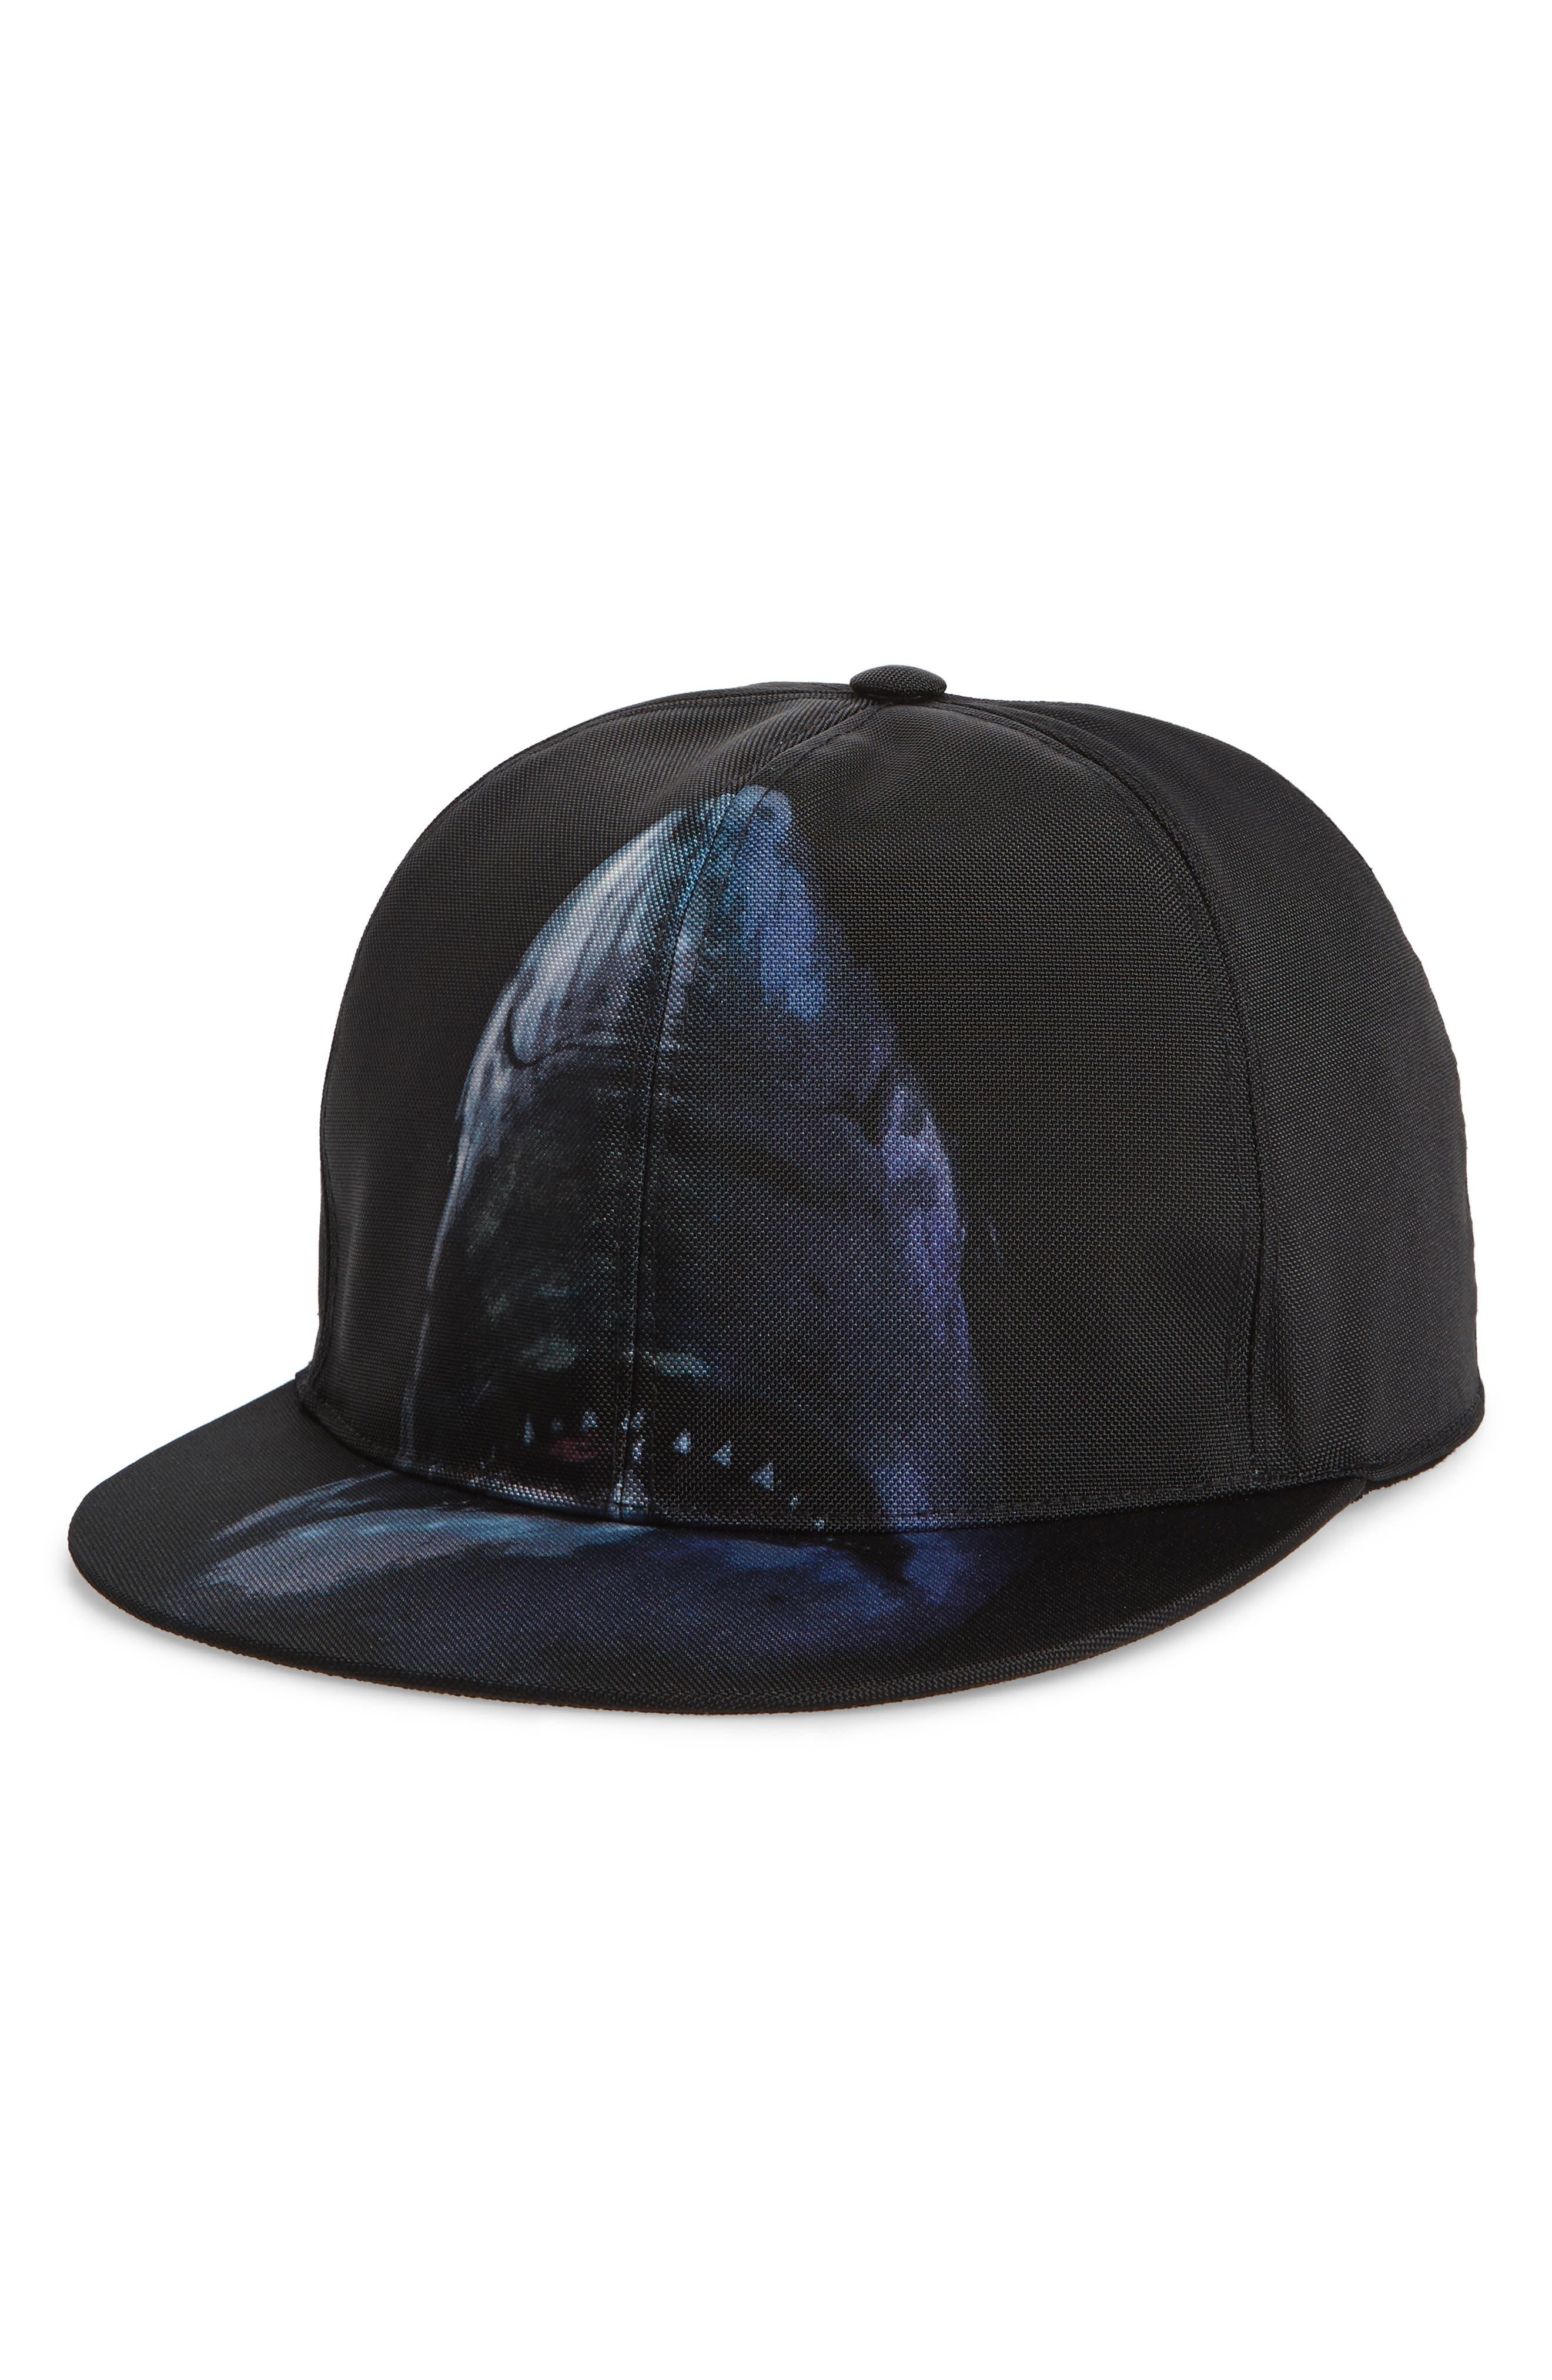 Givenchy Shark Print Ballcap